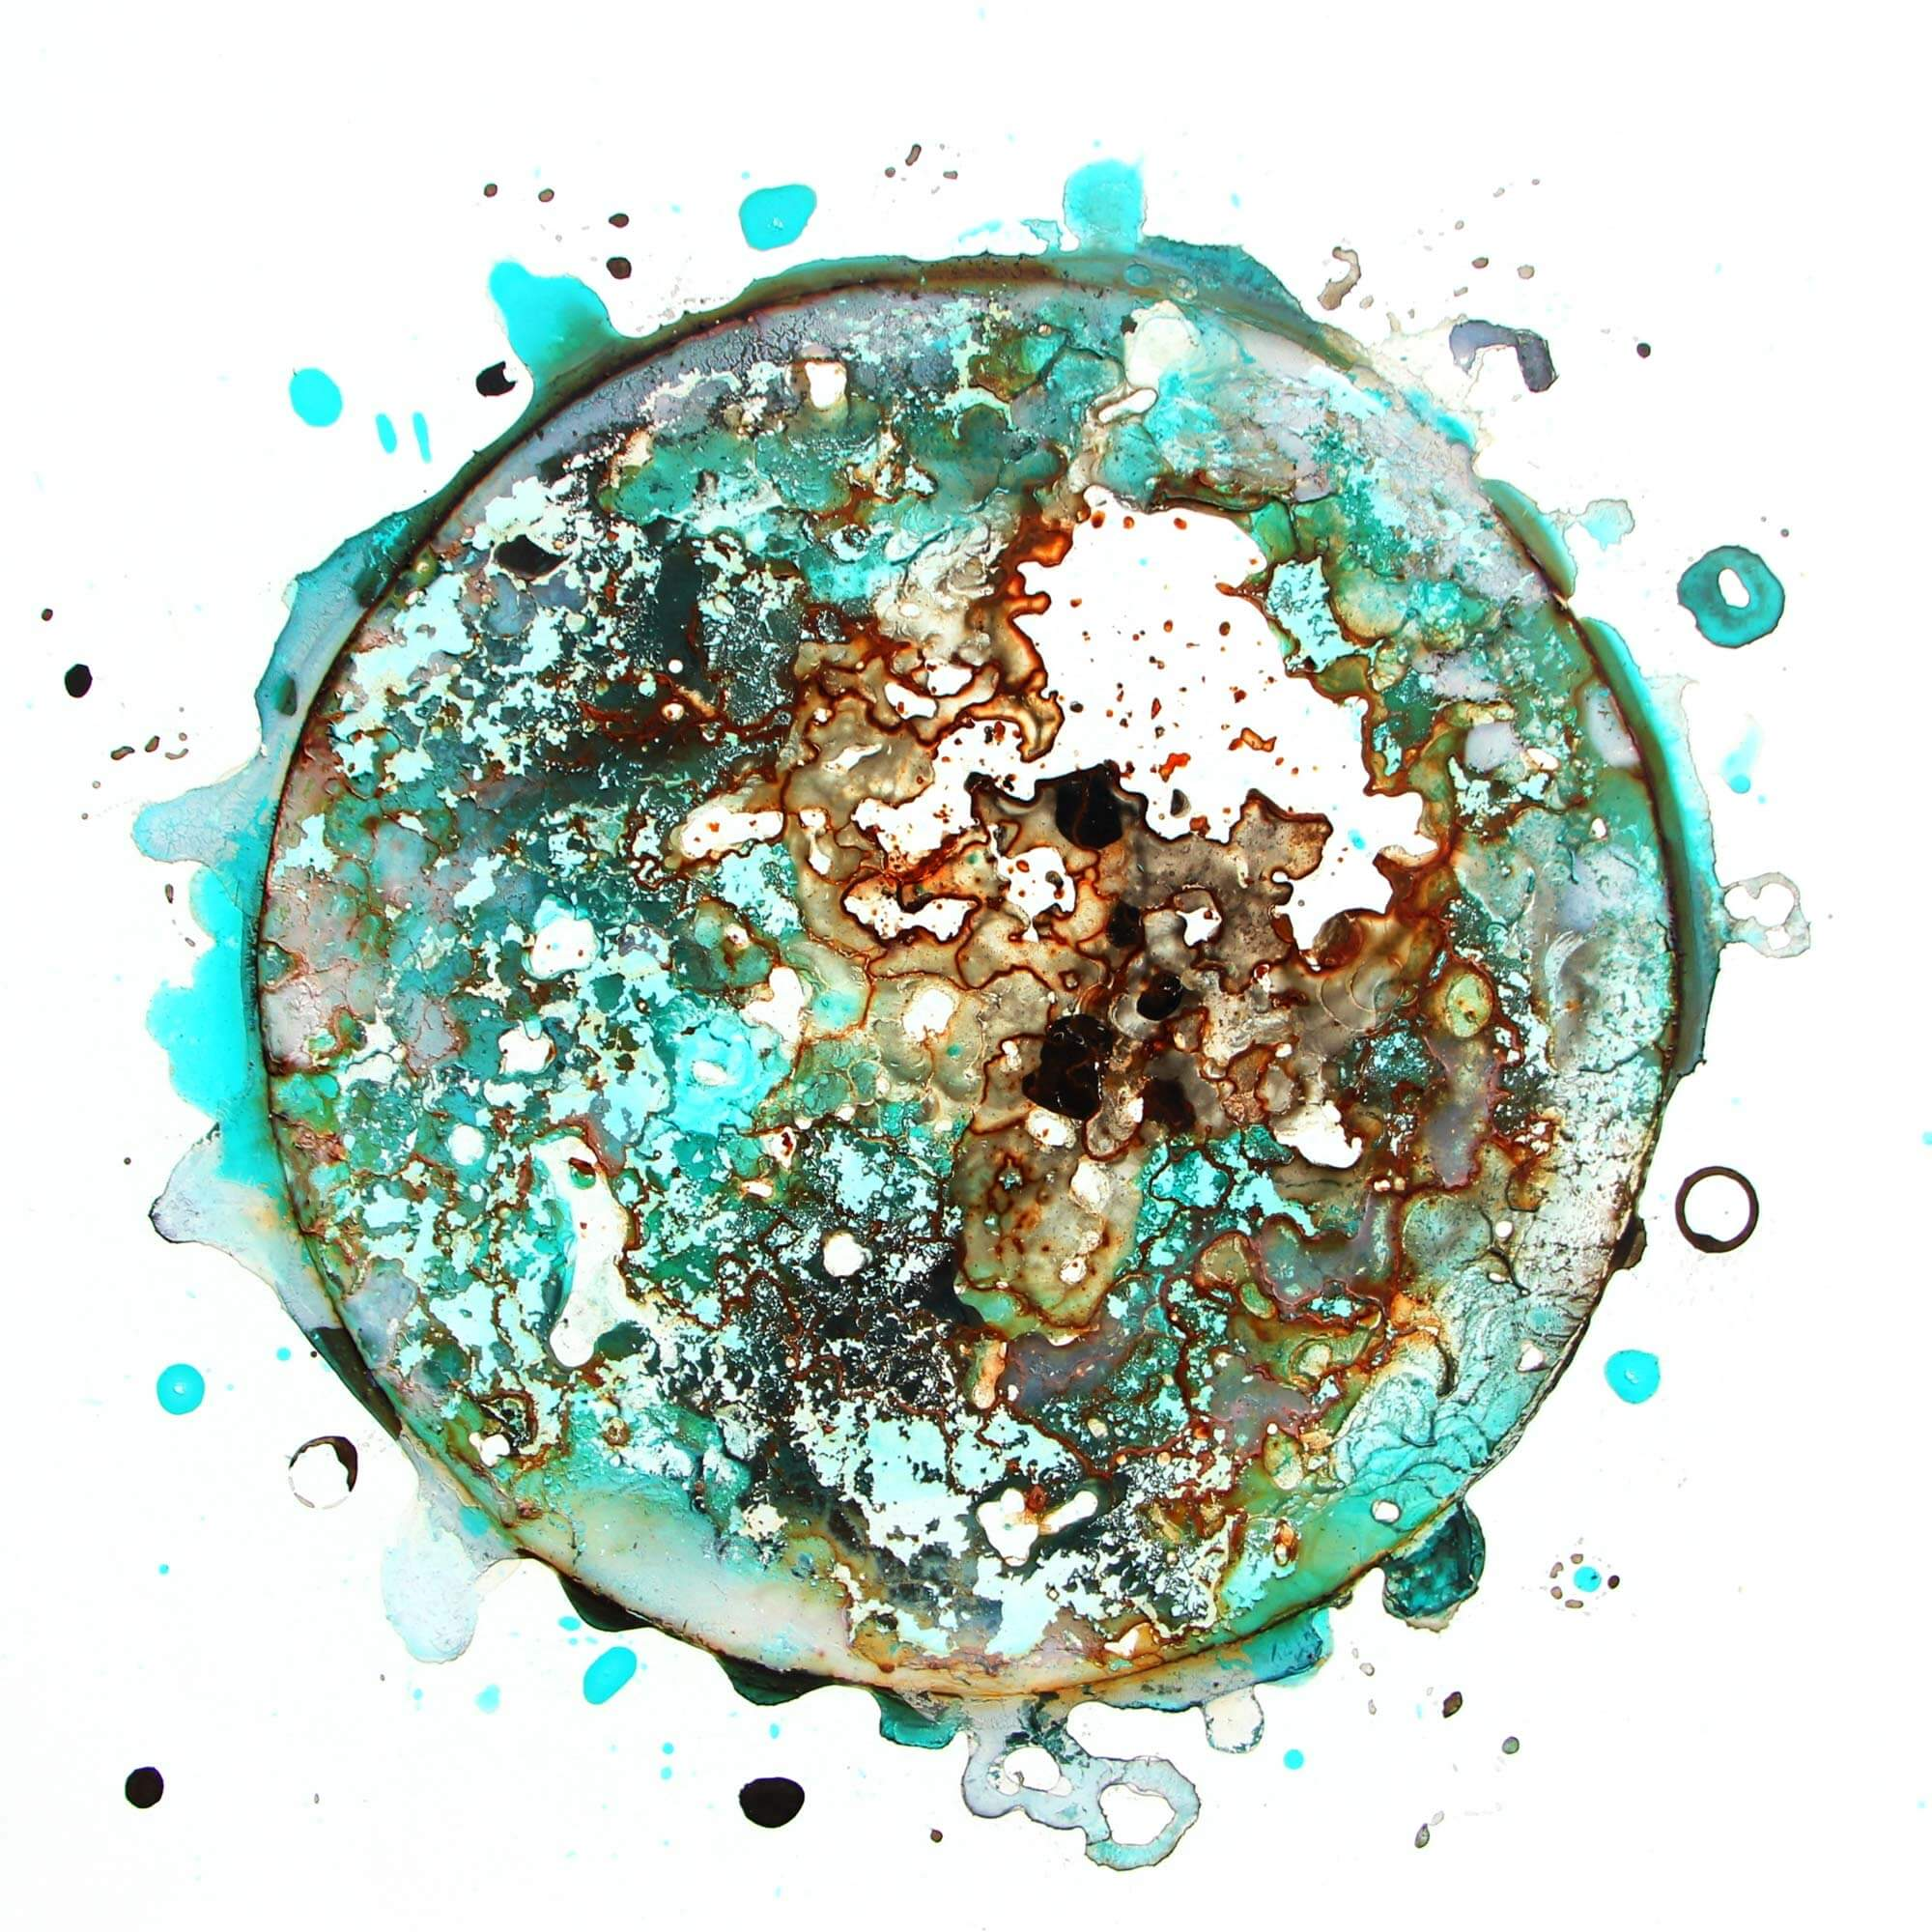 Volker Stamer - Dryingspots 2019 - Water Spirit No. 6